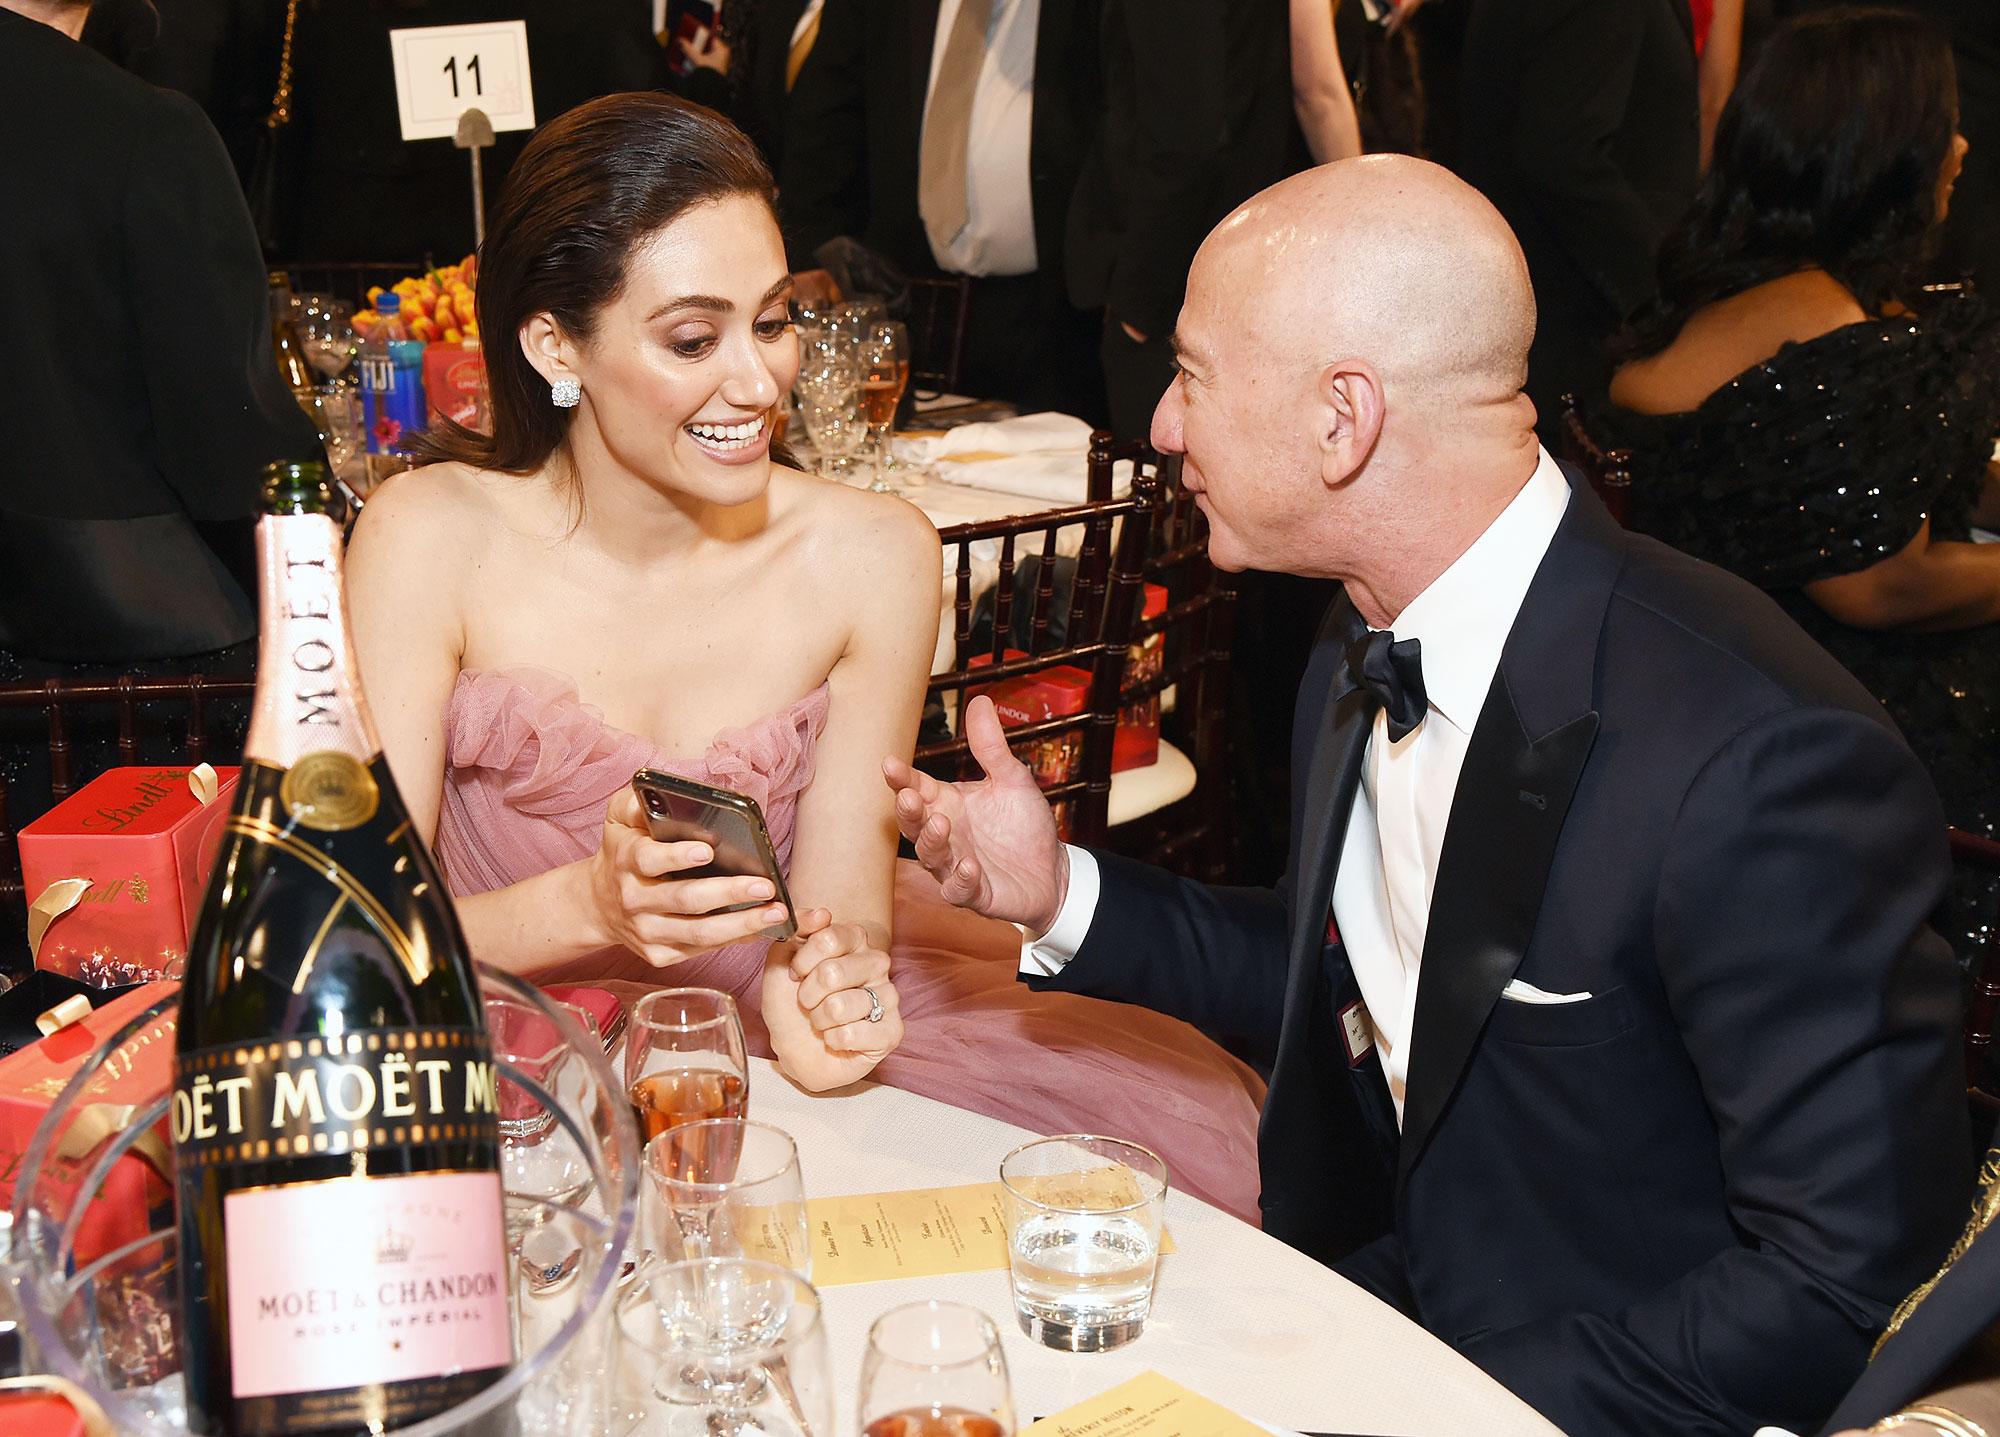 Inside Golden Globes 2019 Emmy Rossum Jeff Bezos - Emmy Rossum showed Amazon founder Jeff Bezos something on her phone during their conversation.